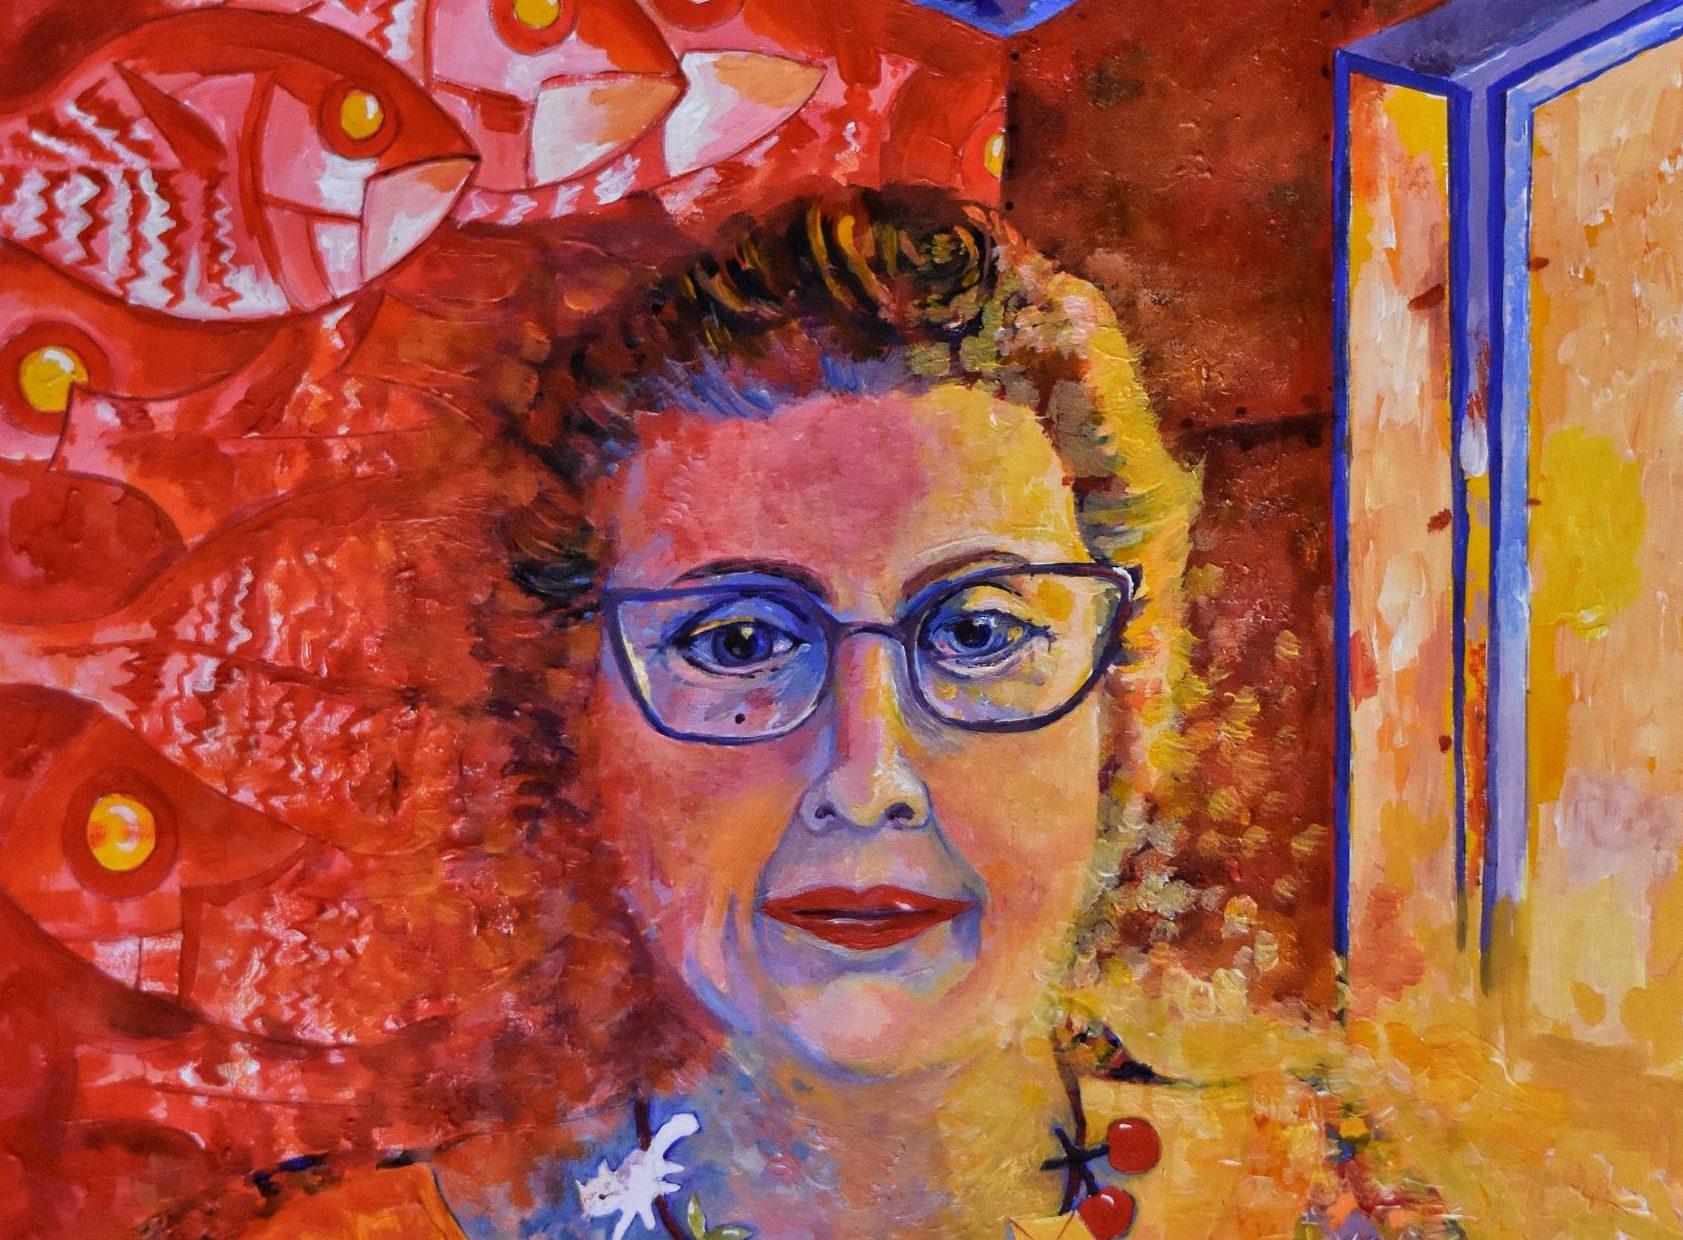 A self portrait by Johnshaven artist Alison Chandler